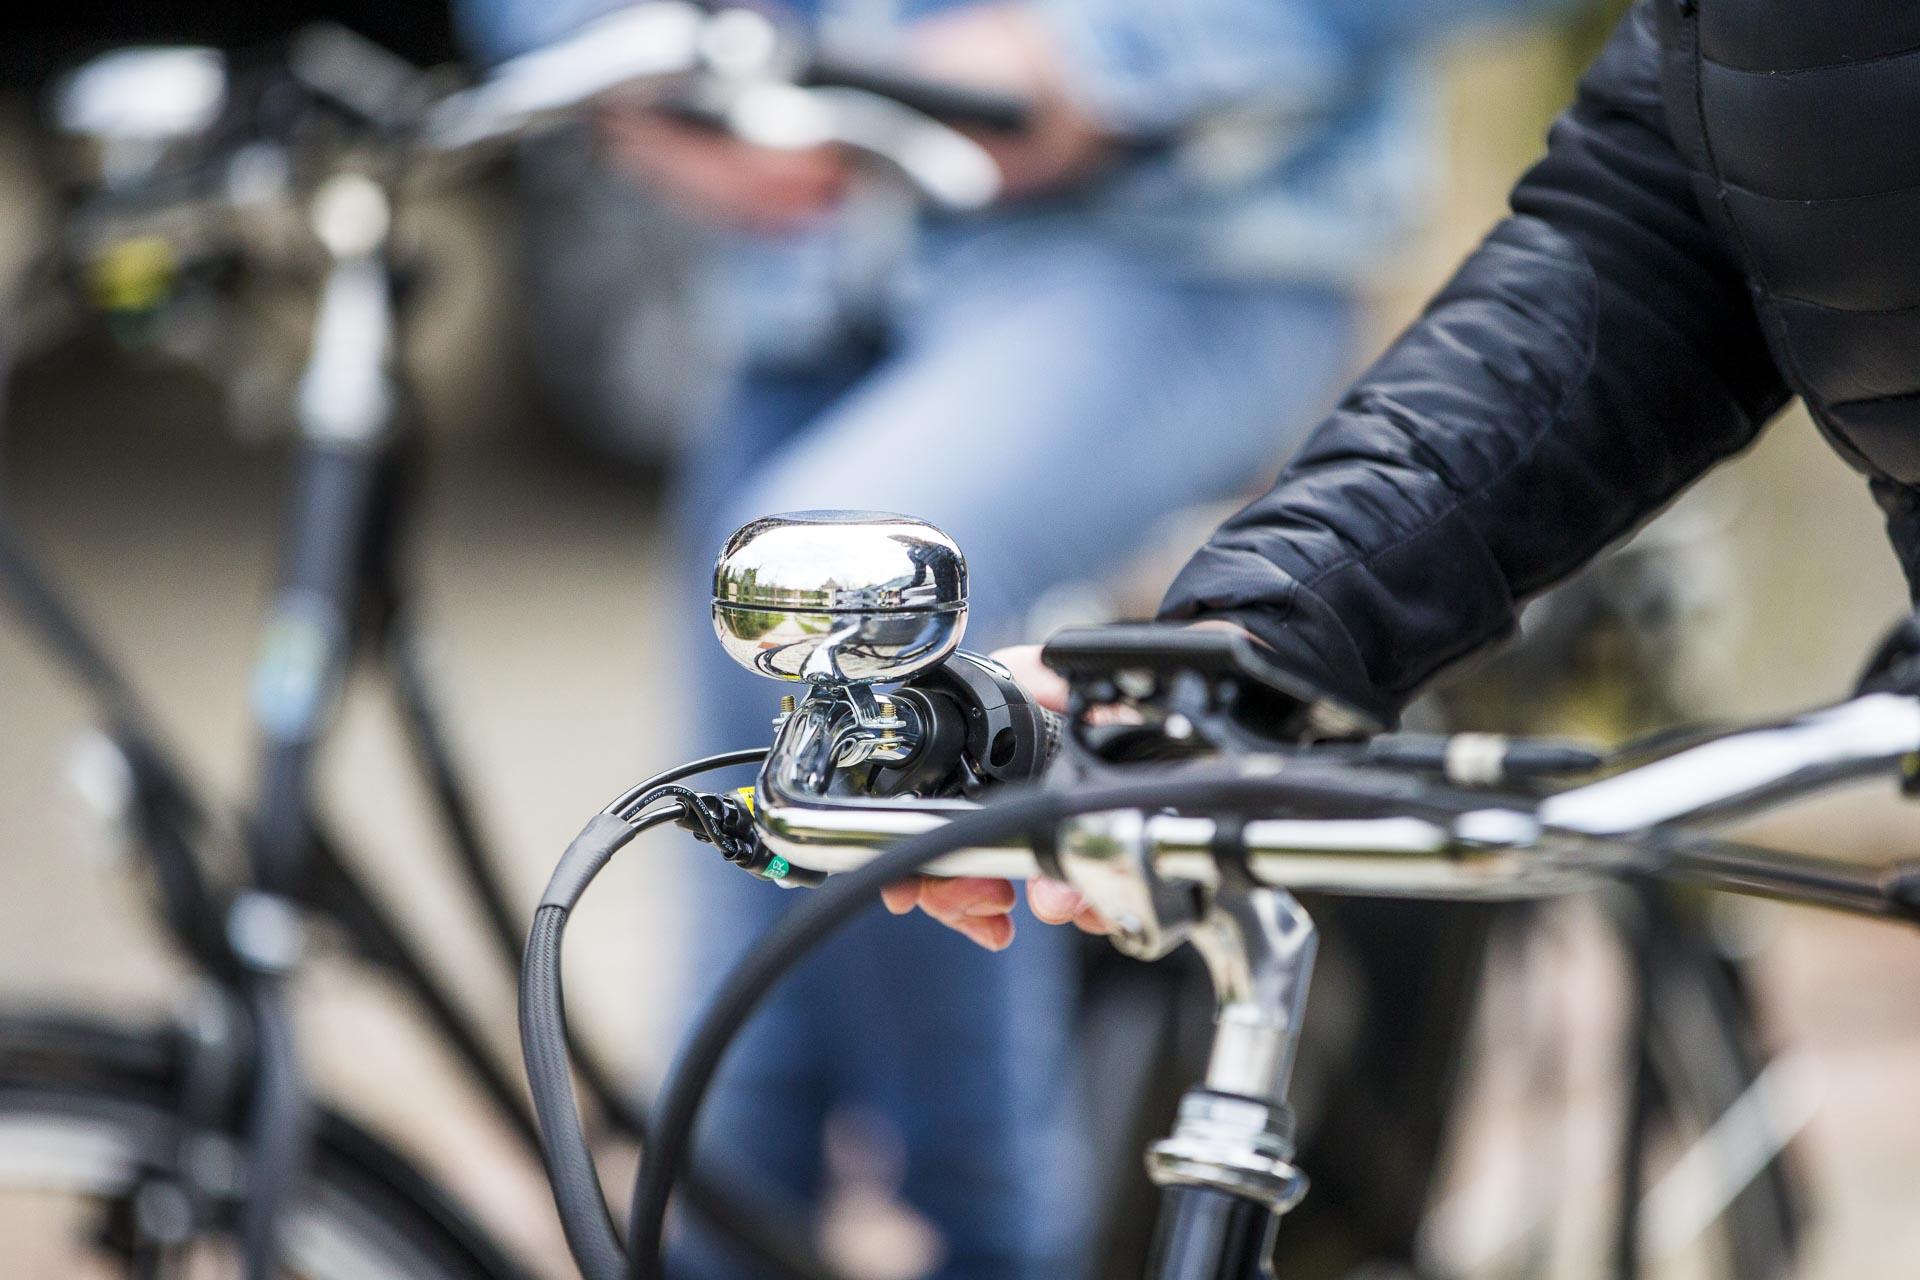 balade à vélo pays d'auge